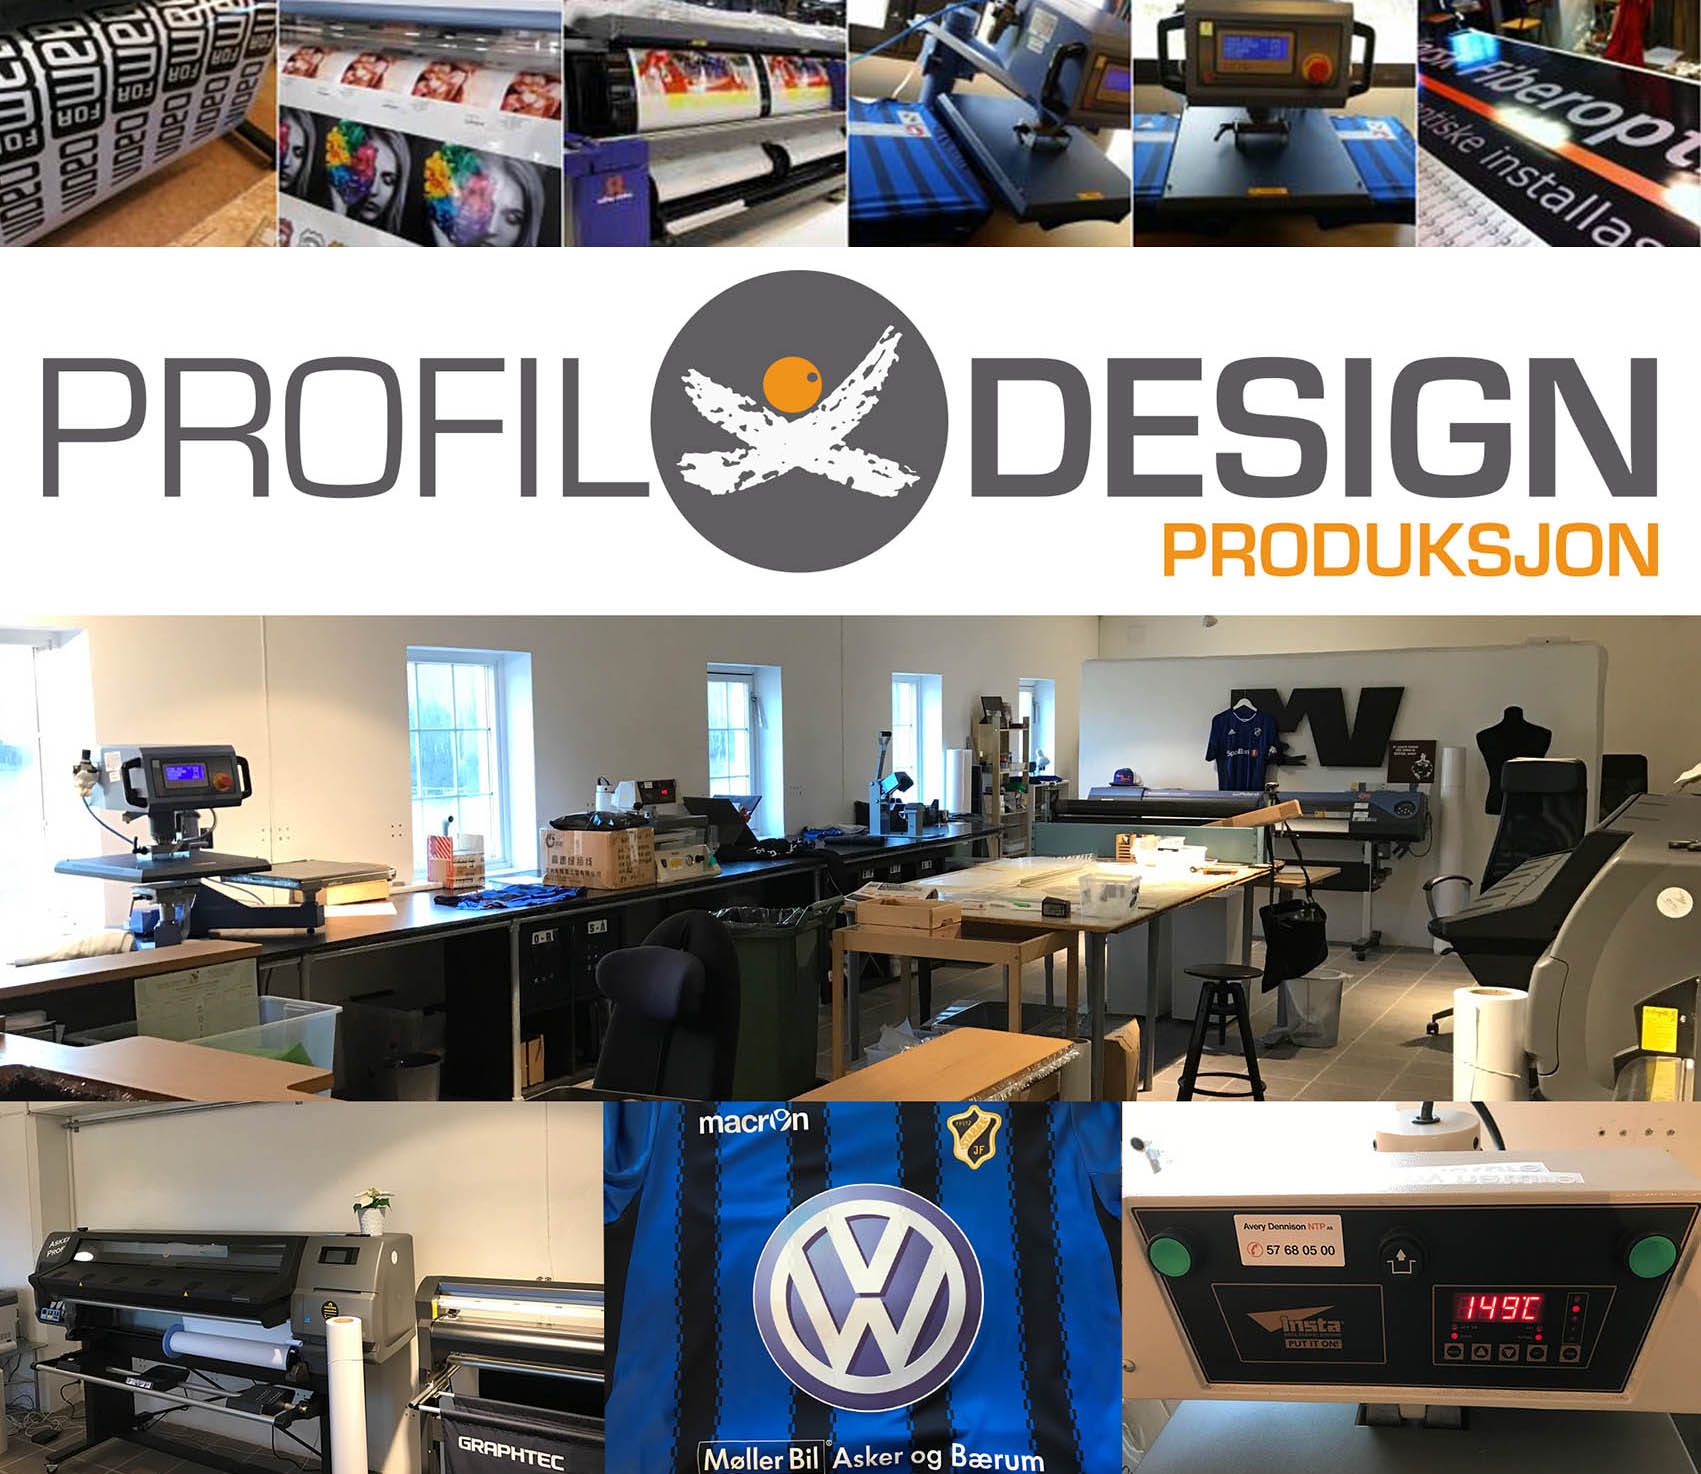 profil-design-produksjon